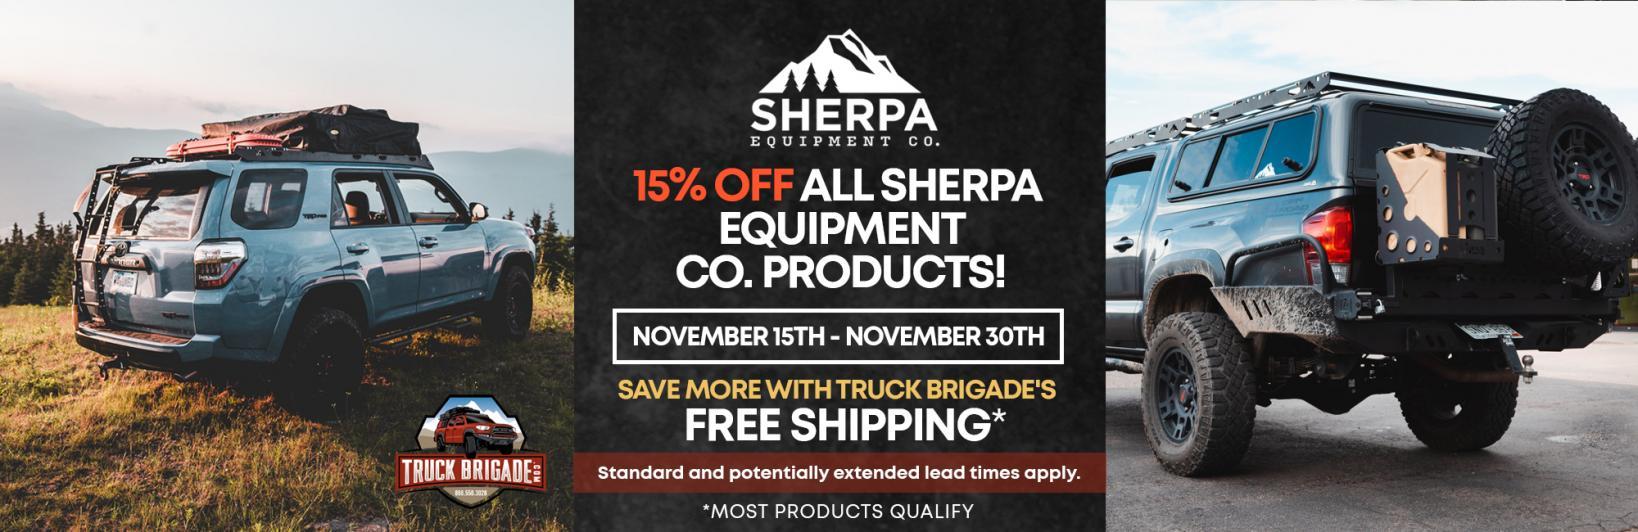 Sherpa Equipment Co. Black Friday Savings!-sherpa_equipment_co_black_friday_web_banner-jpg